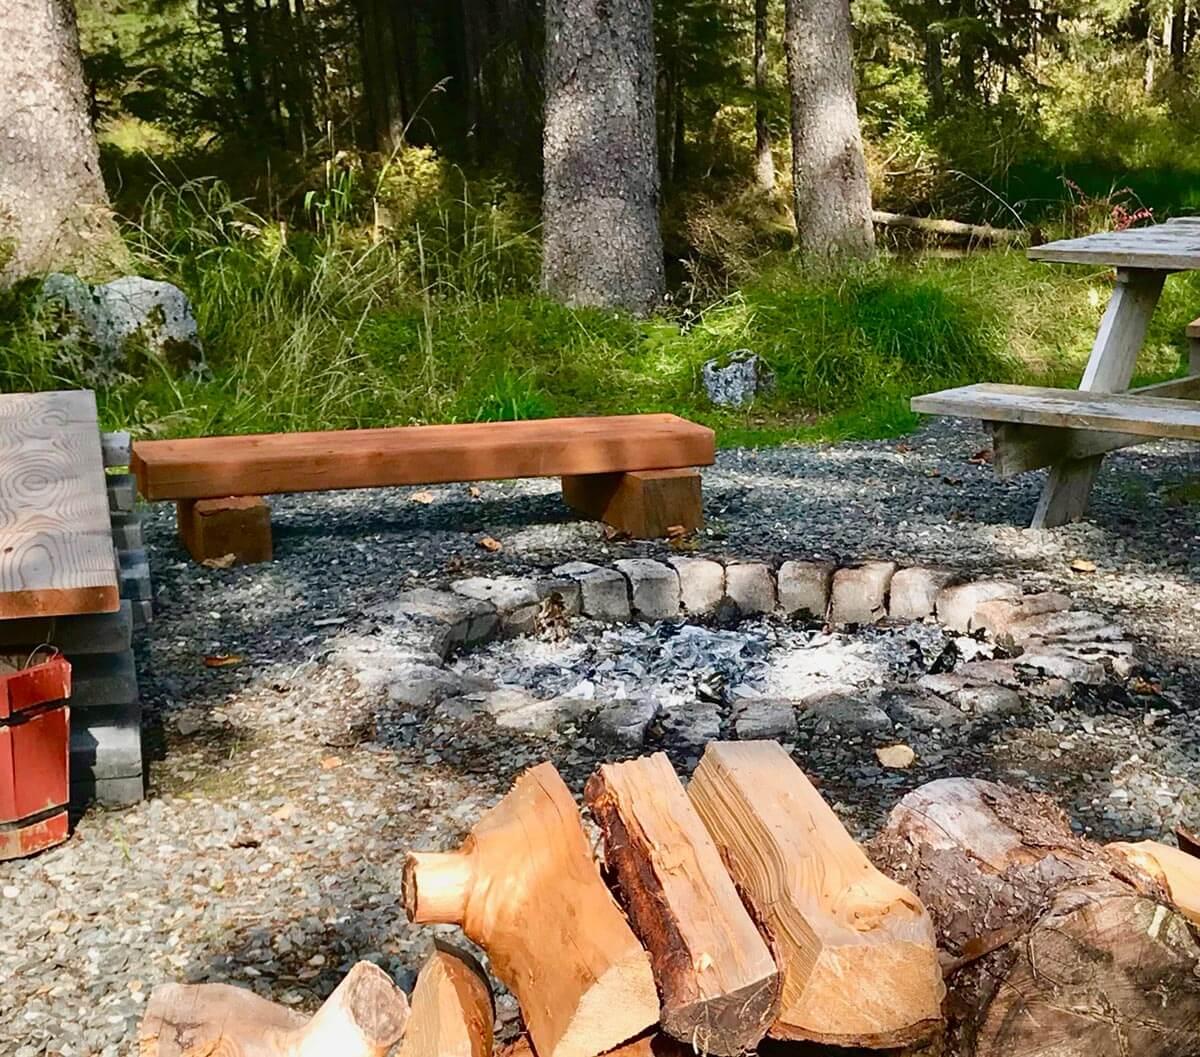 glacier-nalu-camping-juneau-camp-firwe